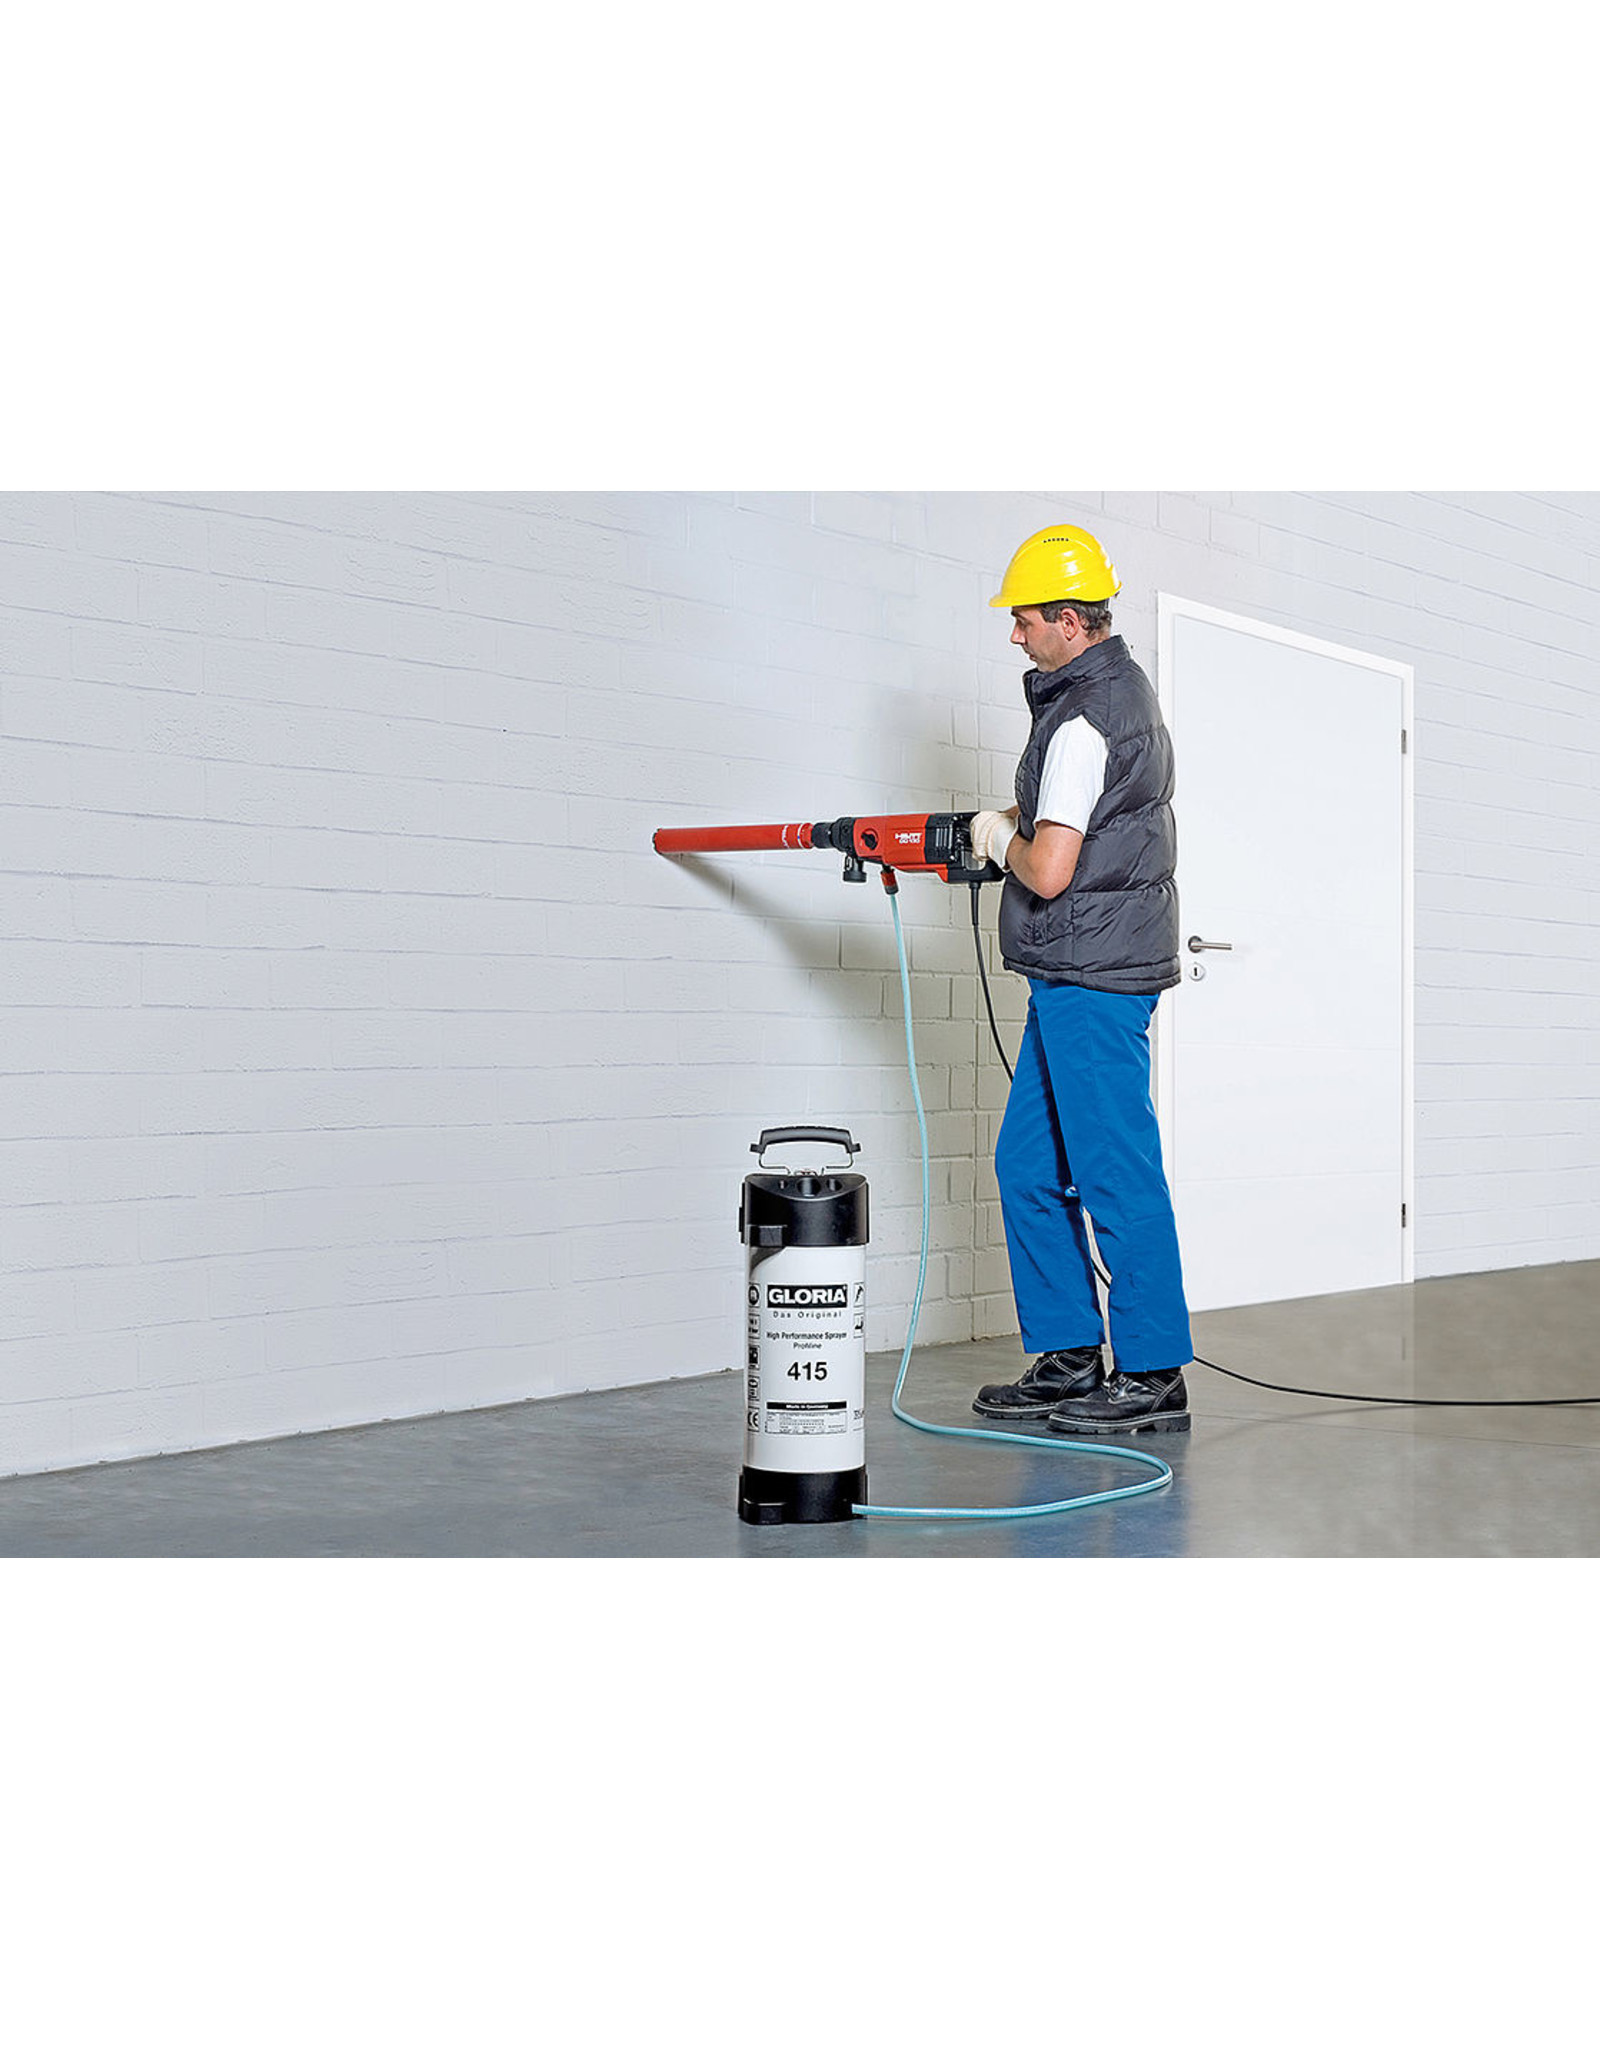 Gloria Industrie Watertoevoerapparaat Staal 415 Profiline - 10 liter